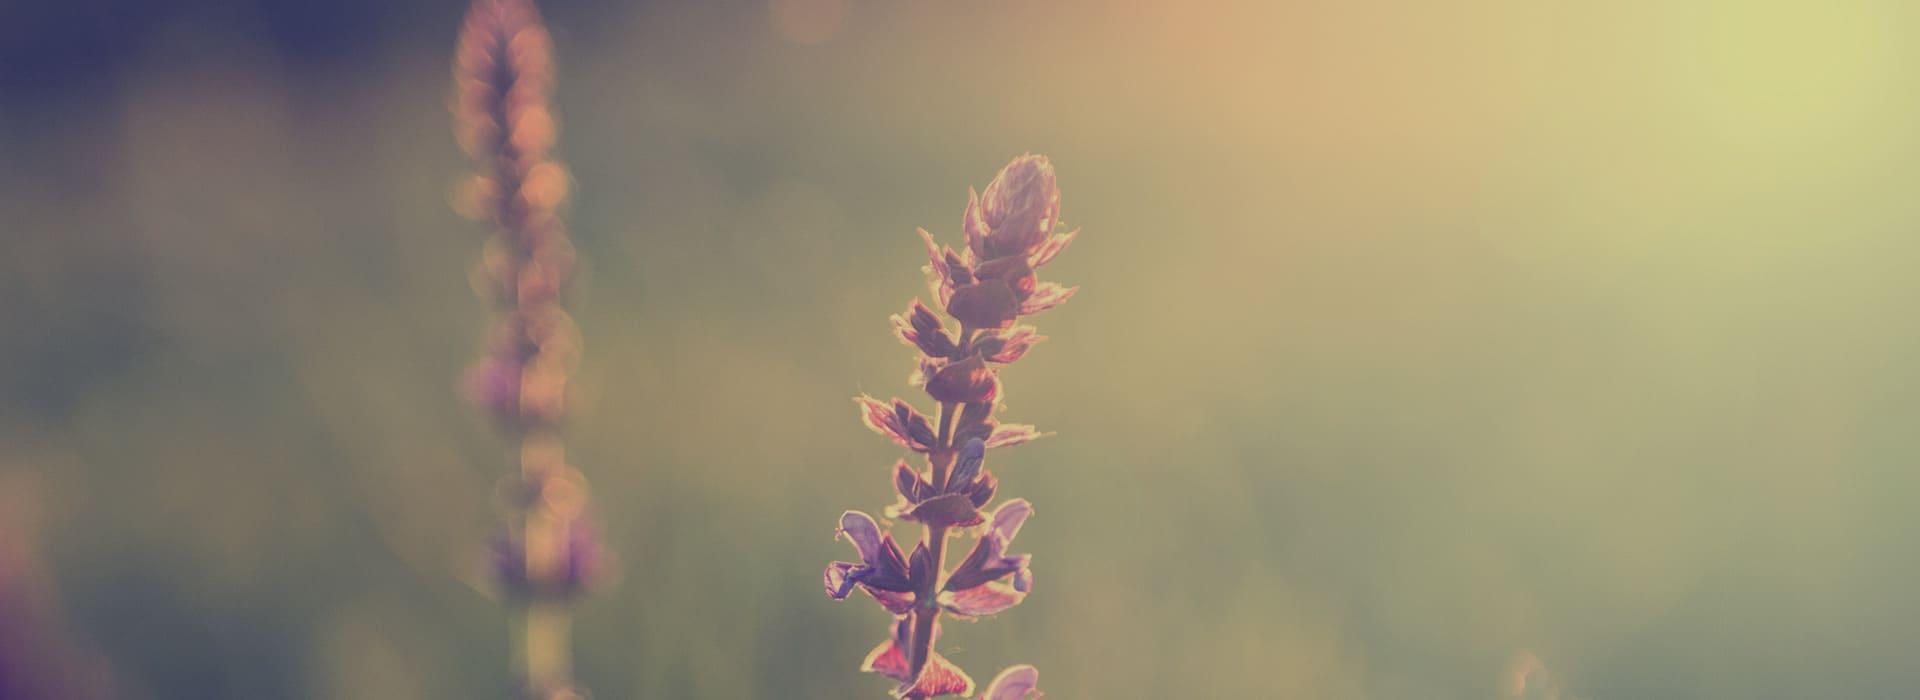 Healing & Growth